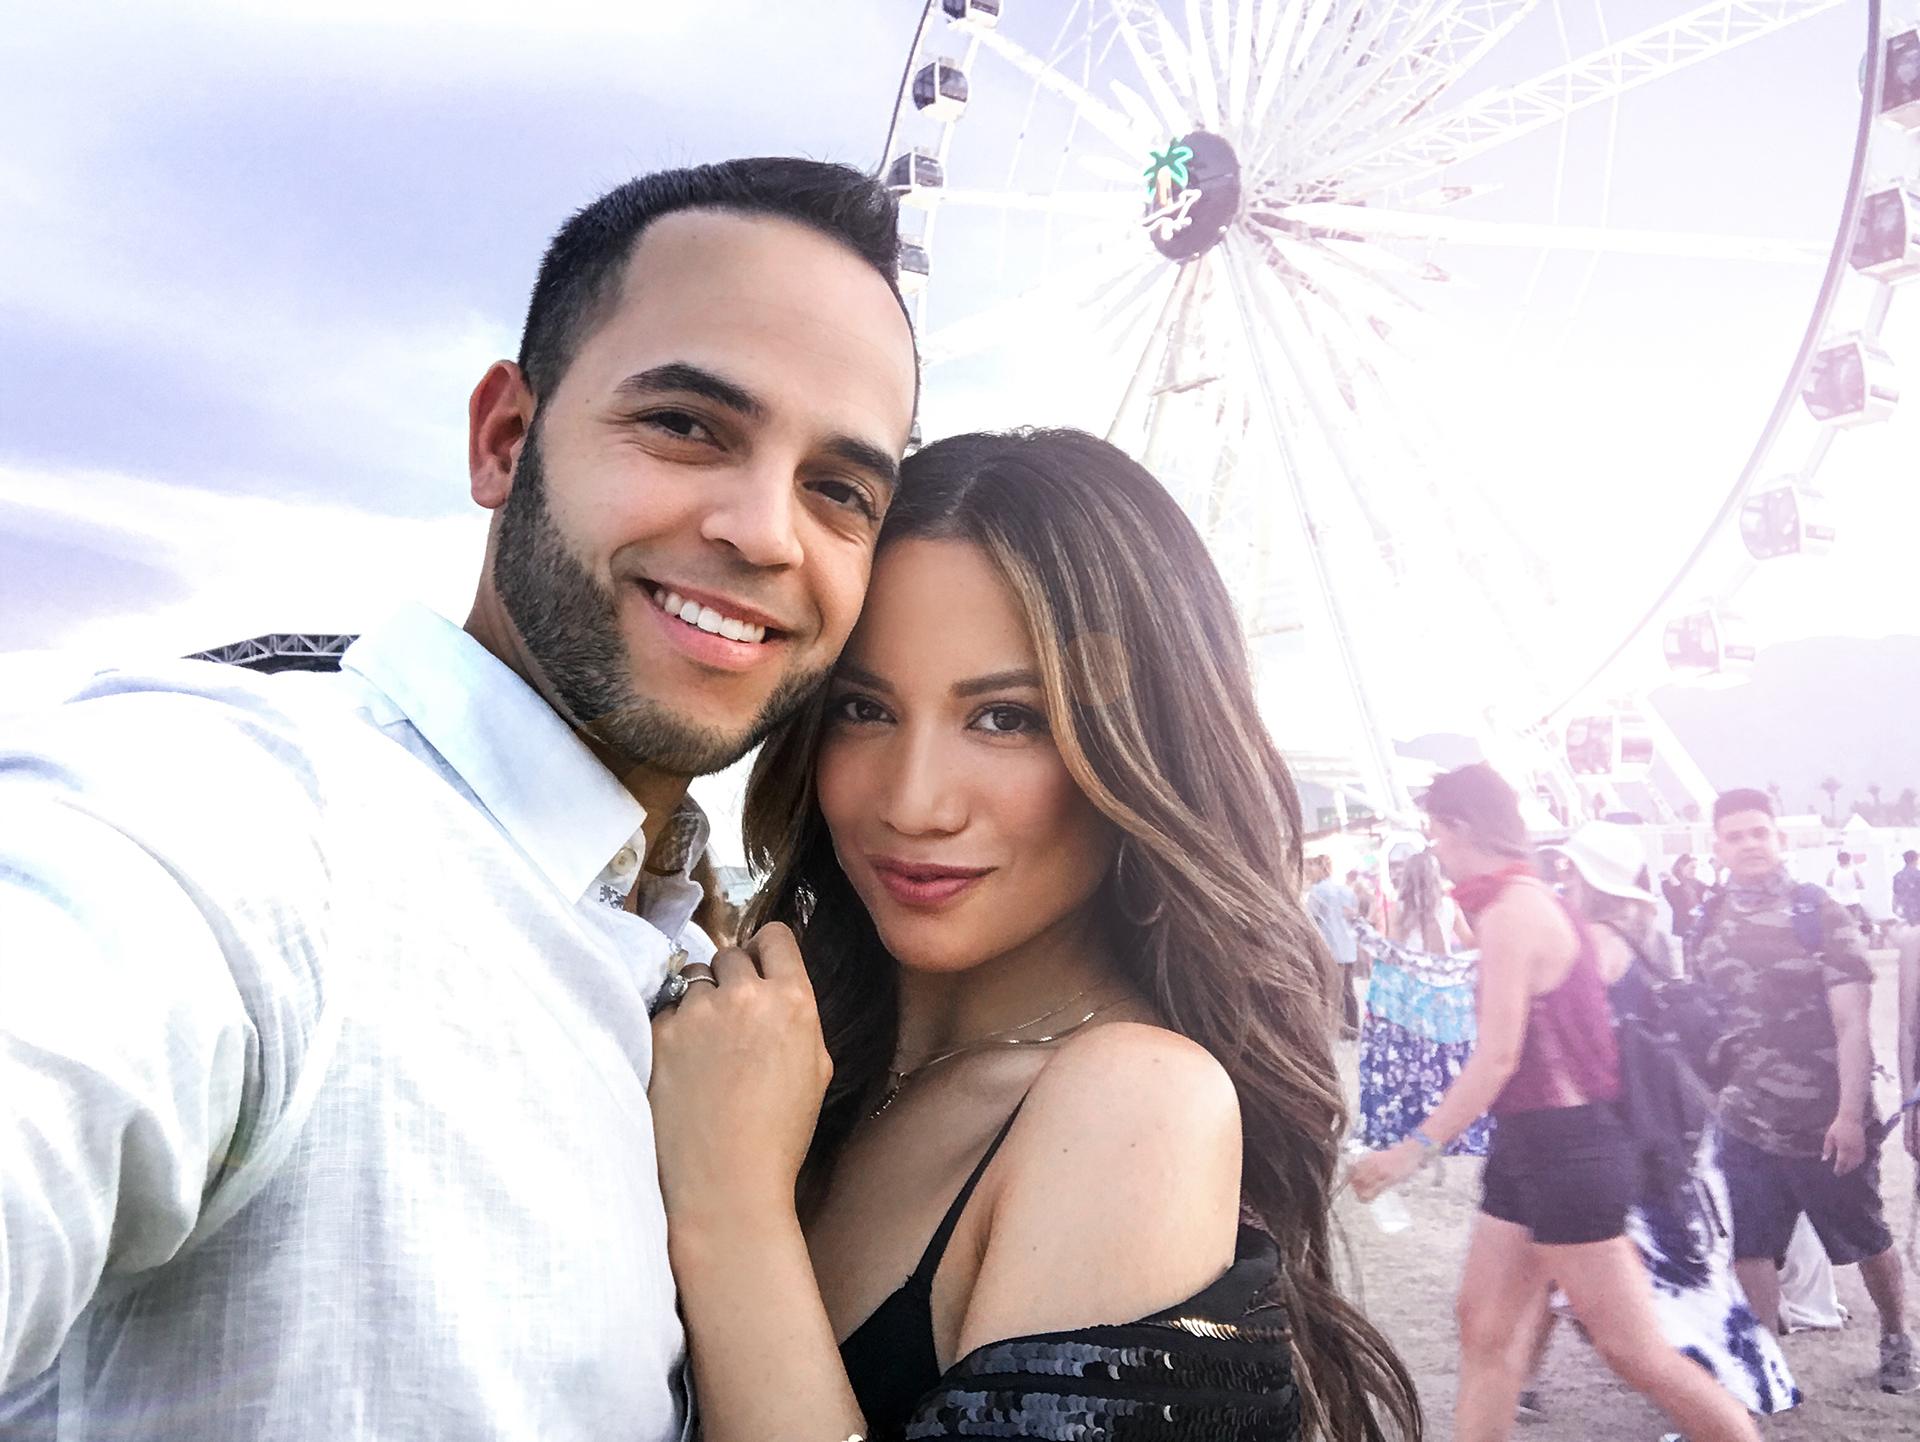 Jessi Malay Husband Coachella 2018